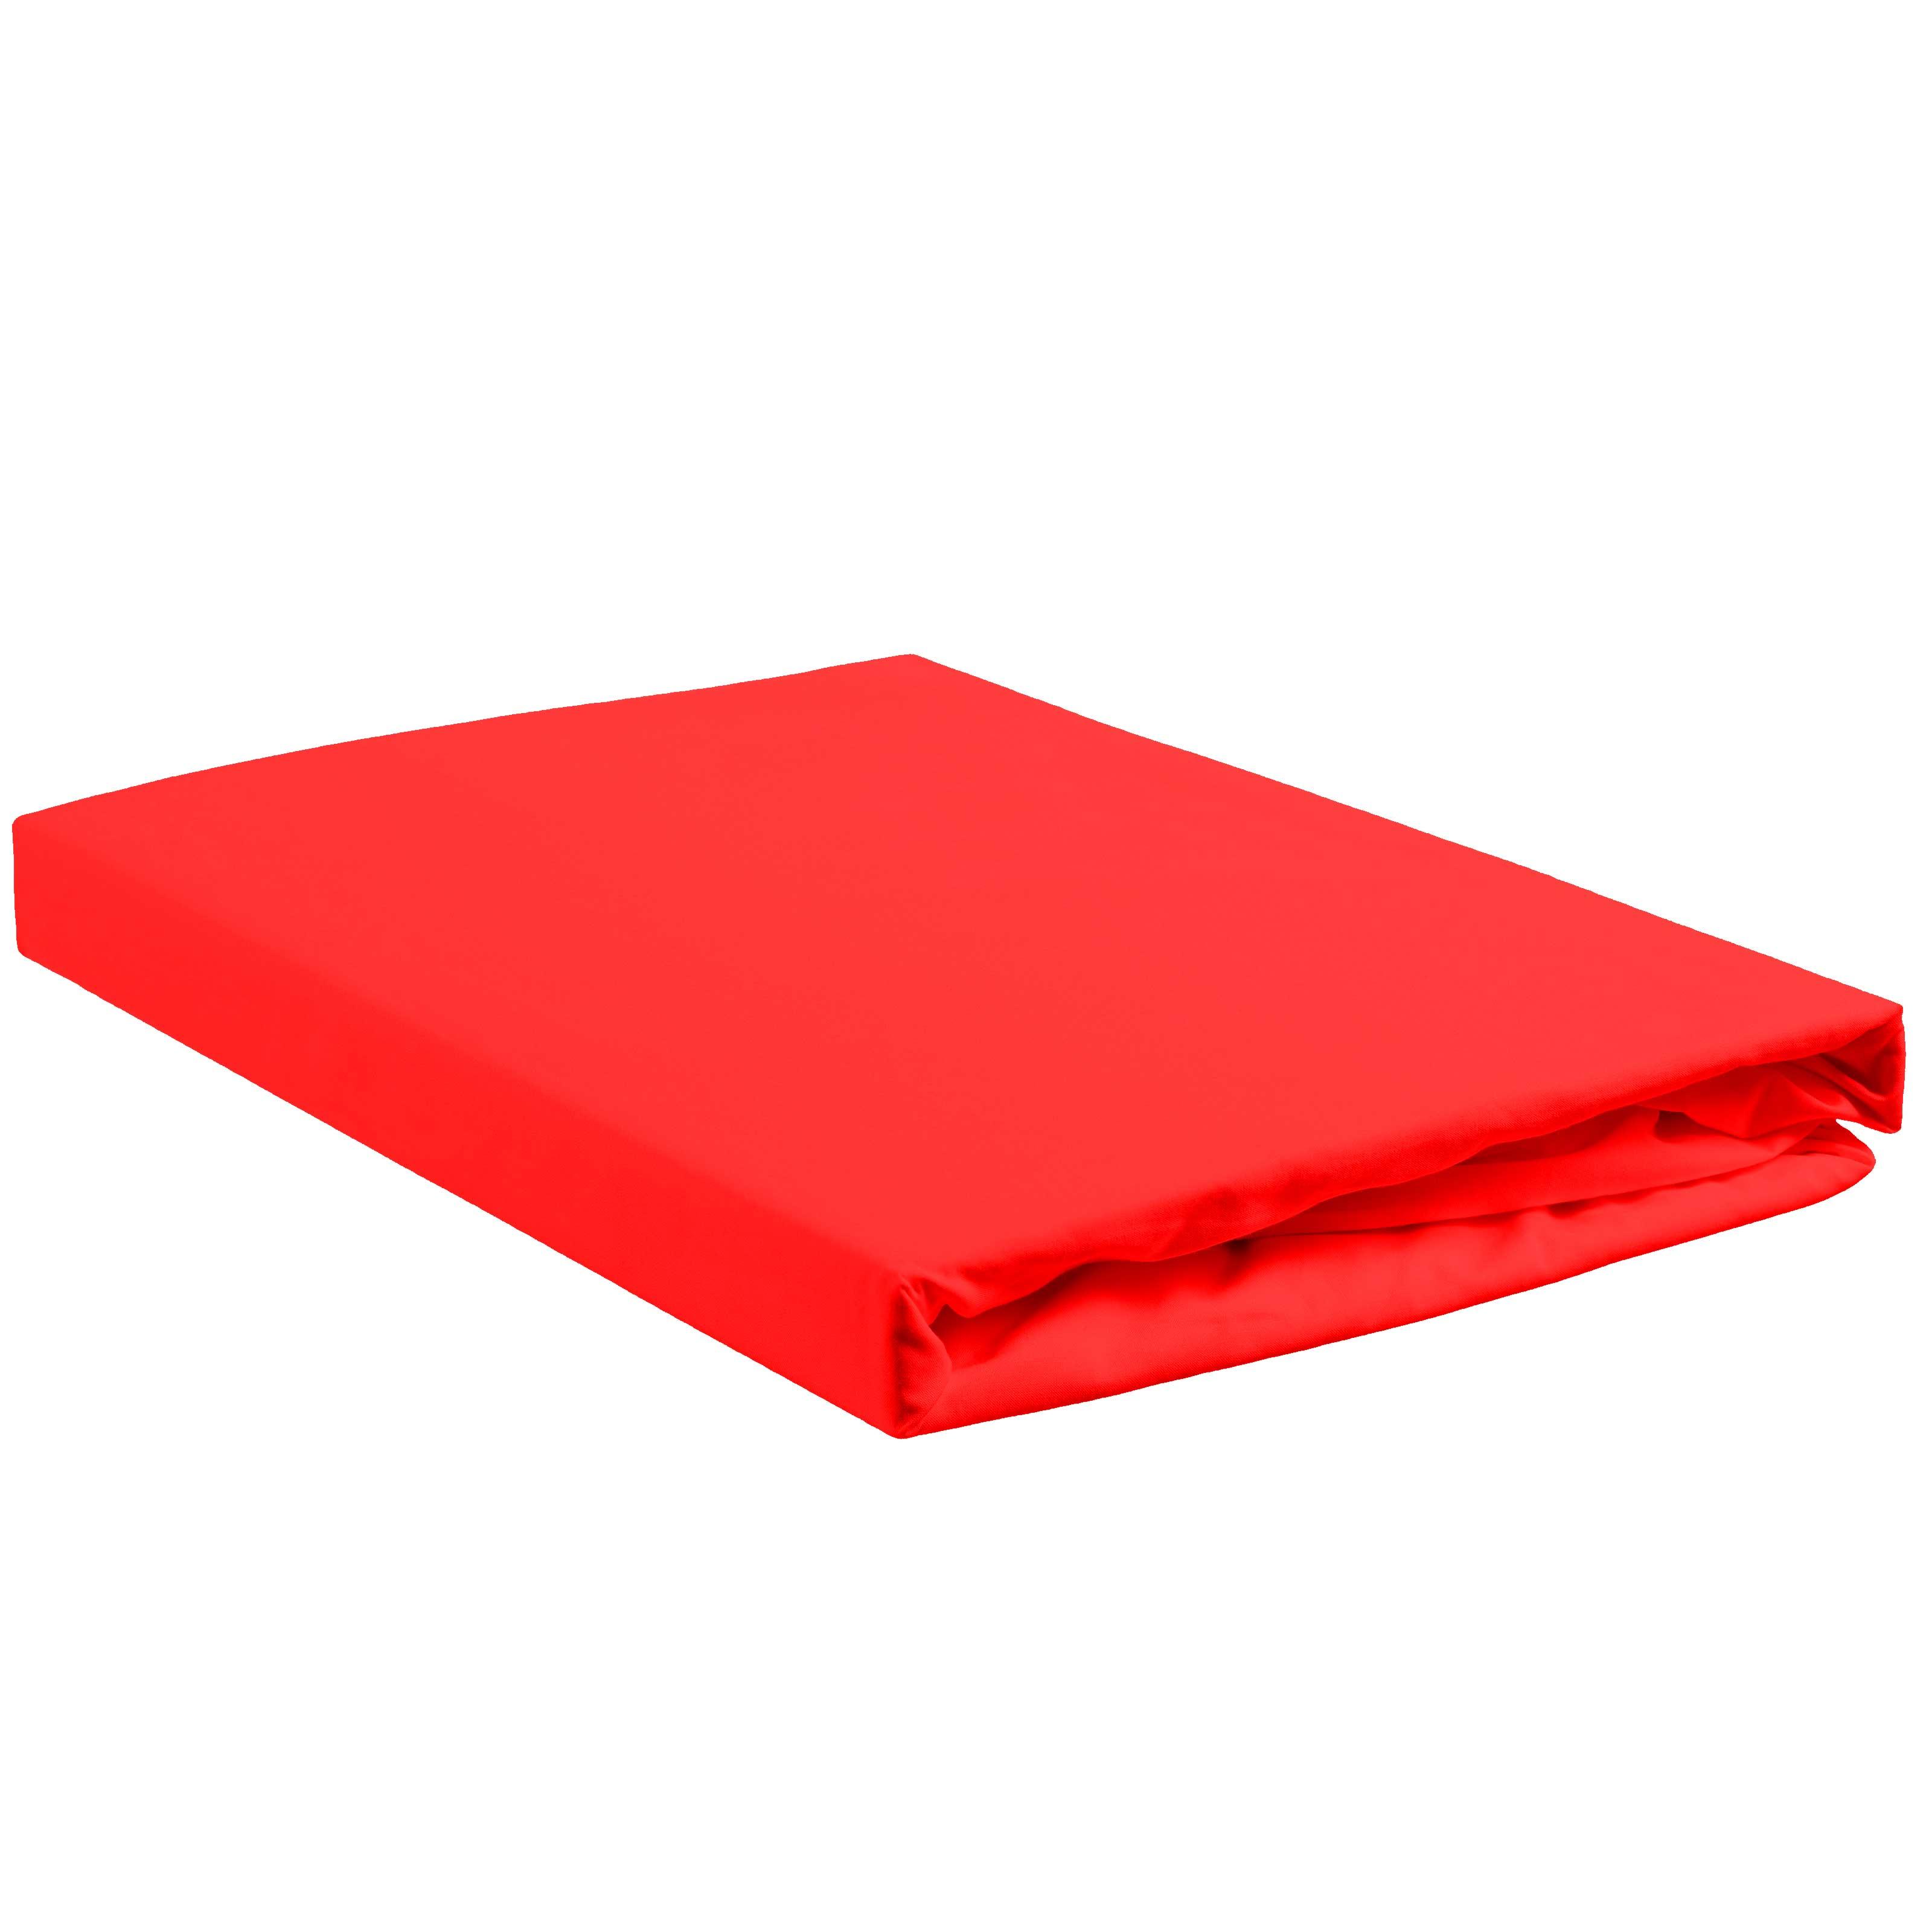 BH jersey faconlagen 140/160x200/220x28 Rød thumbnail